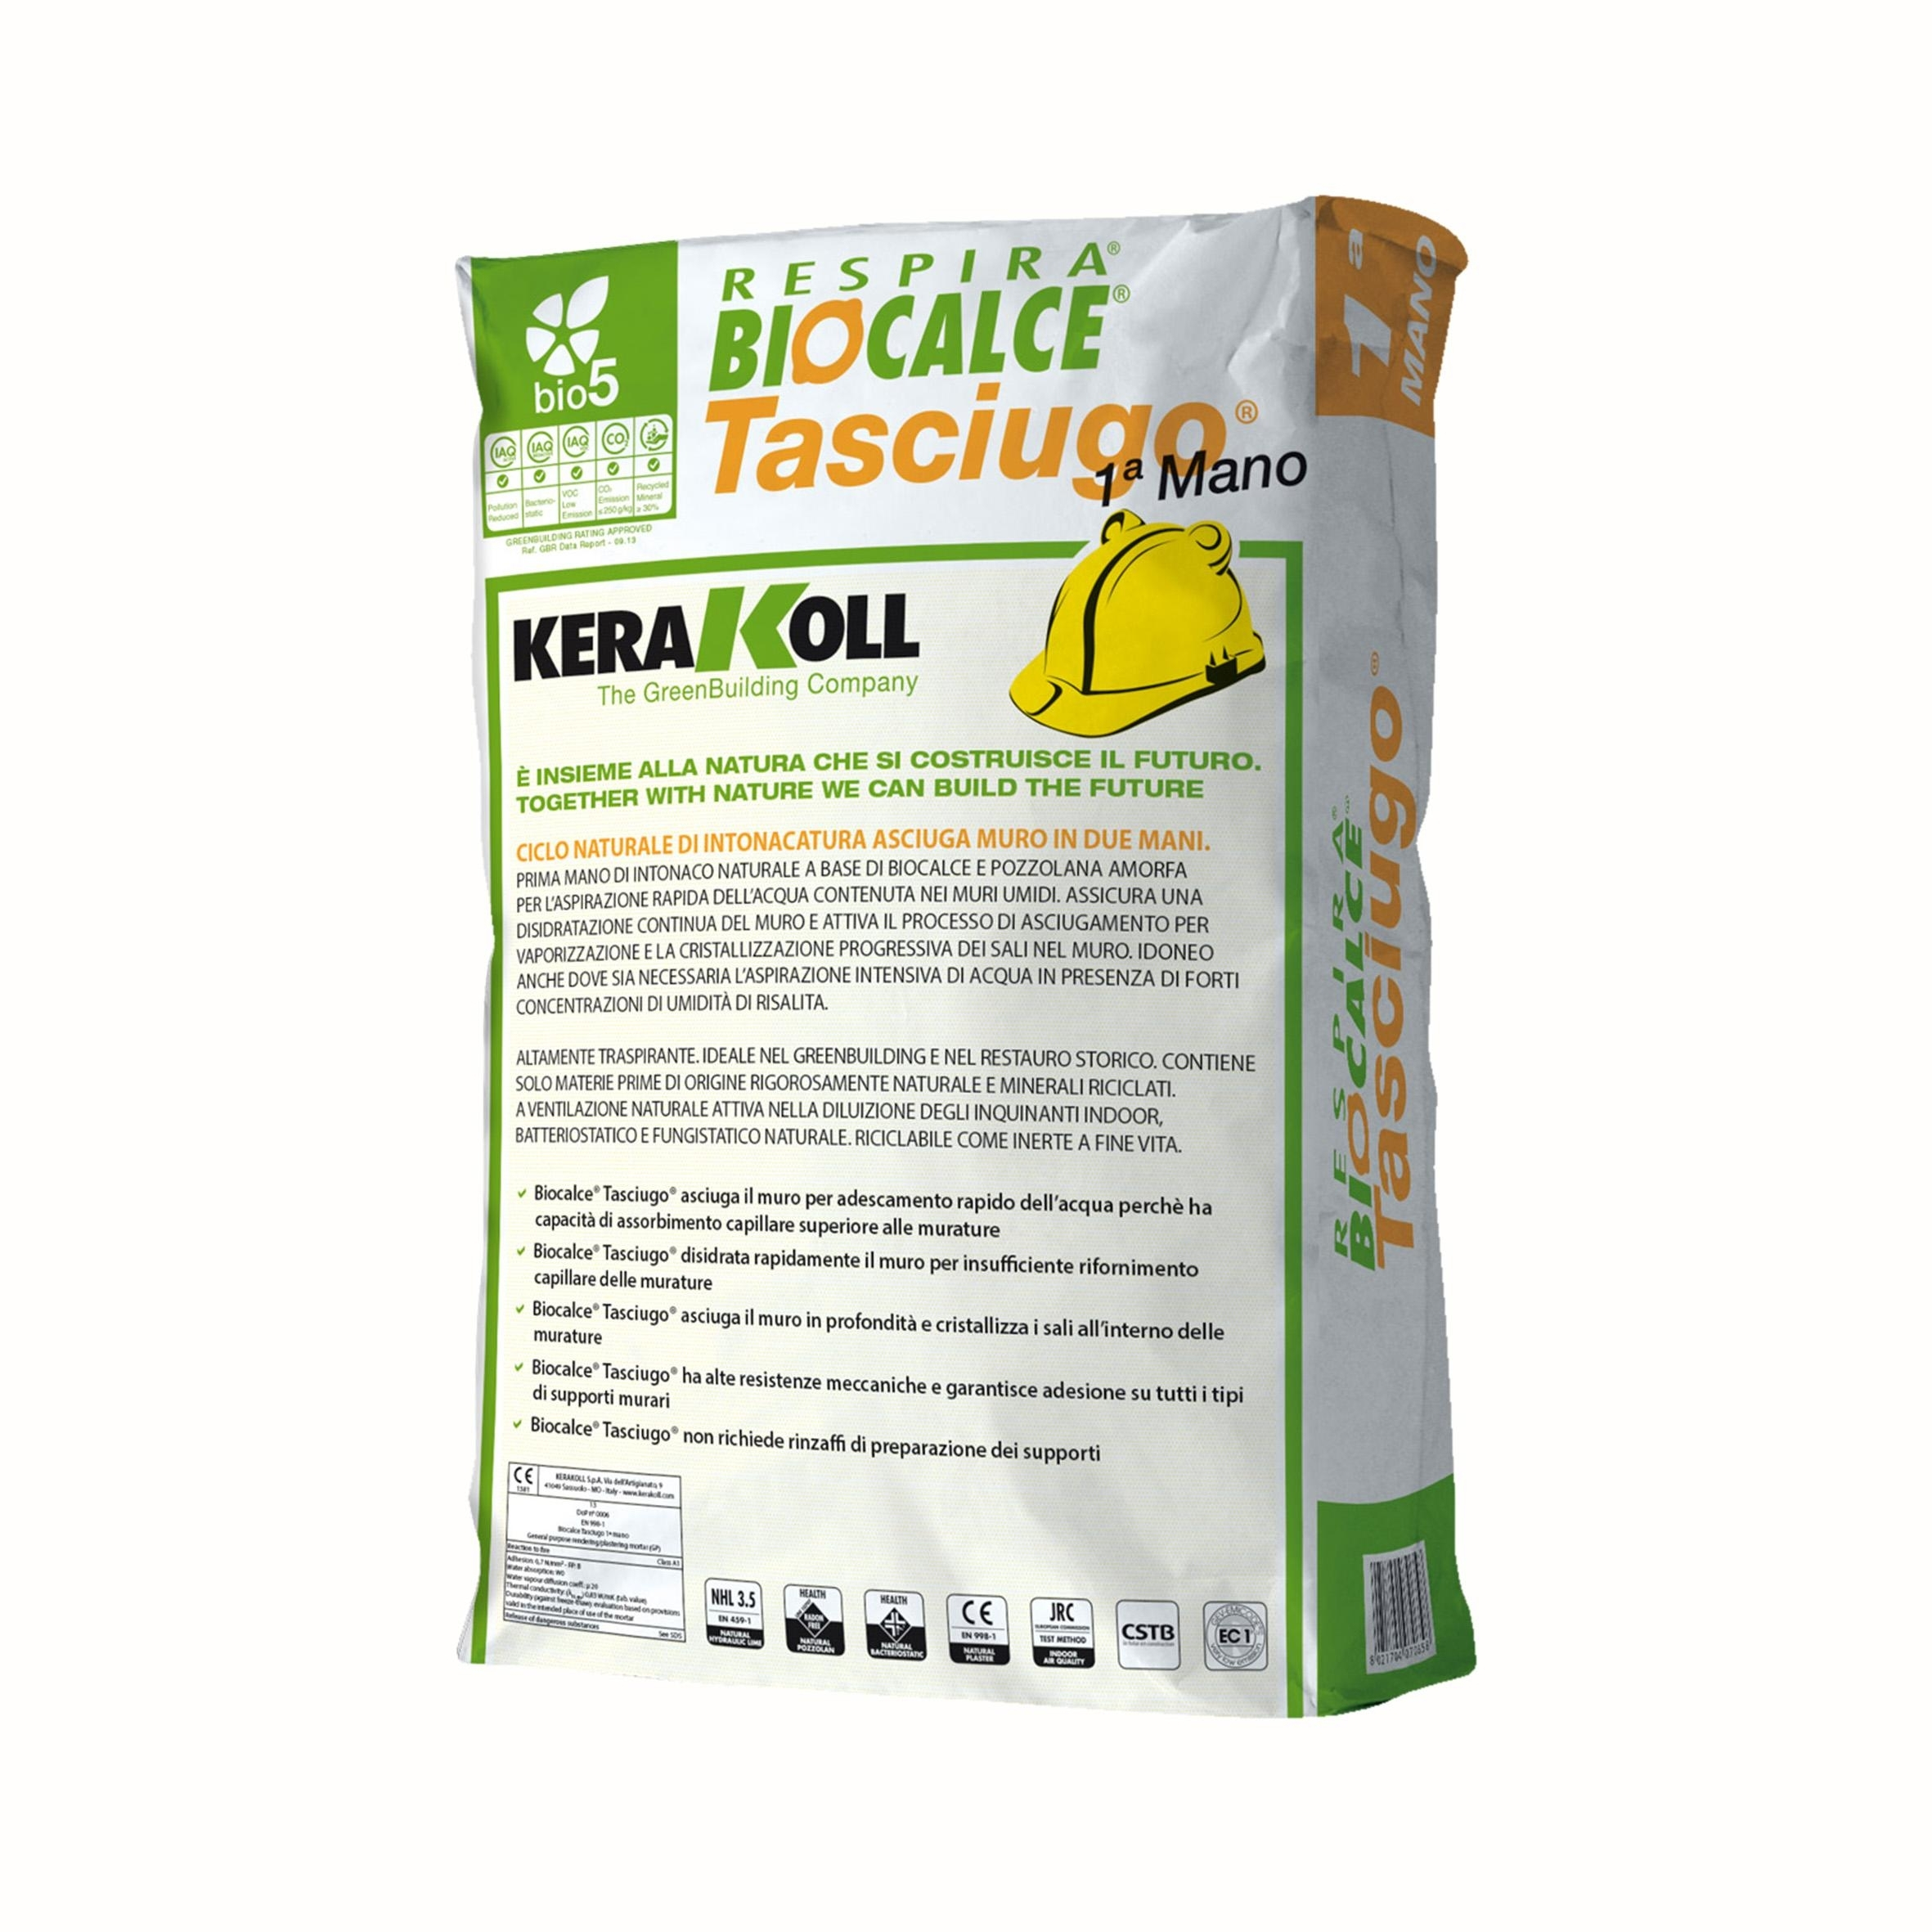 Kerakoll Tasciugo Biocalce 1 Mano Kg 25